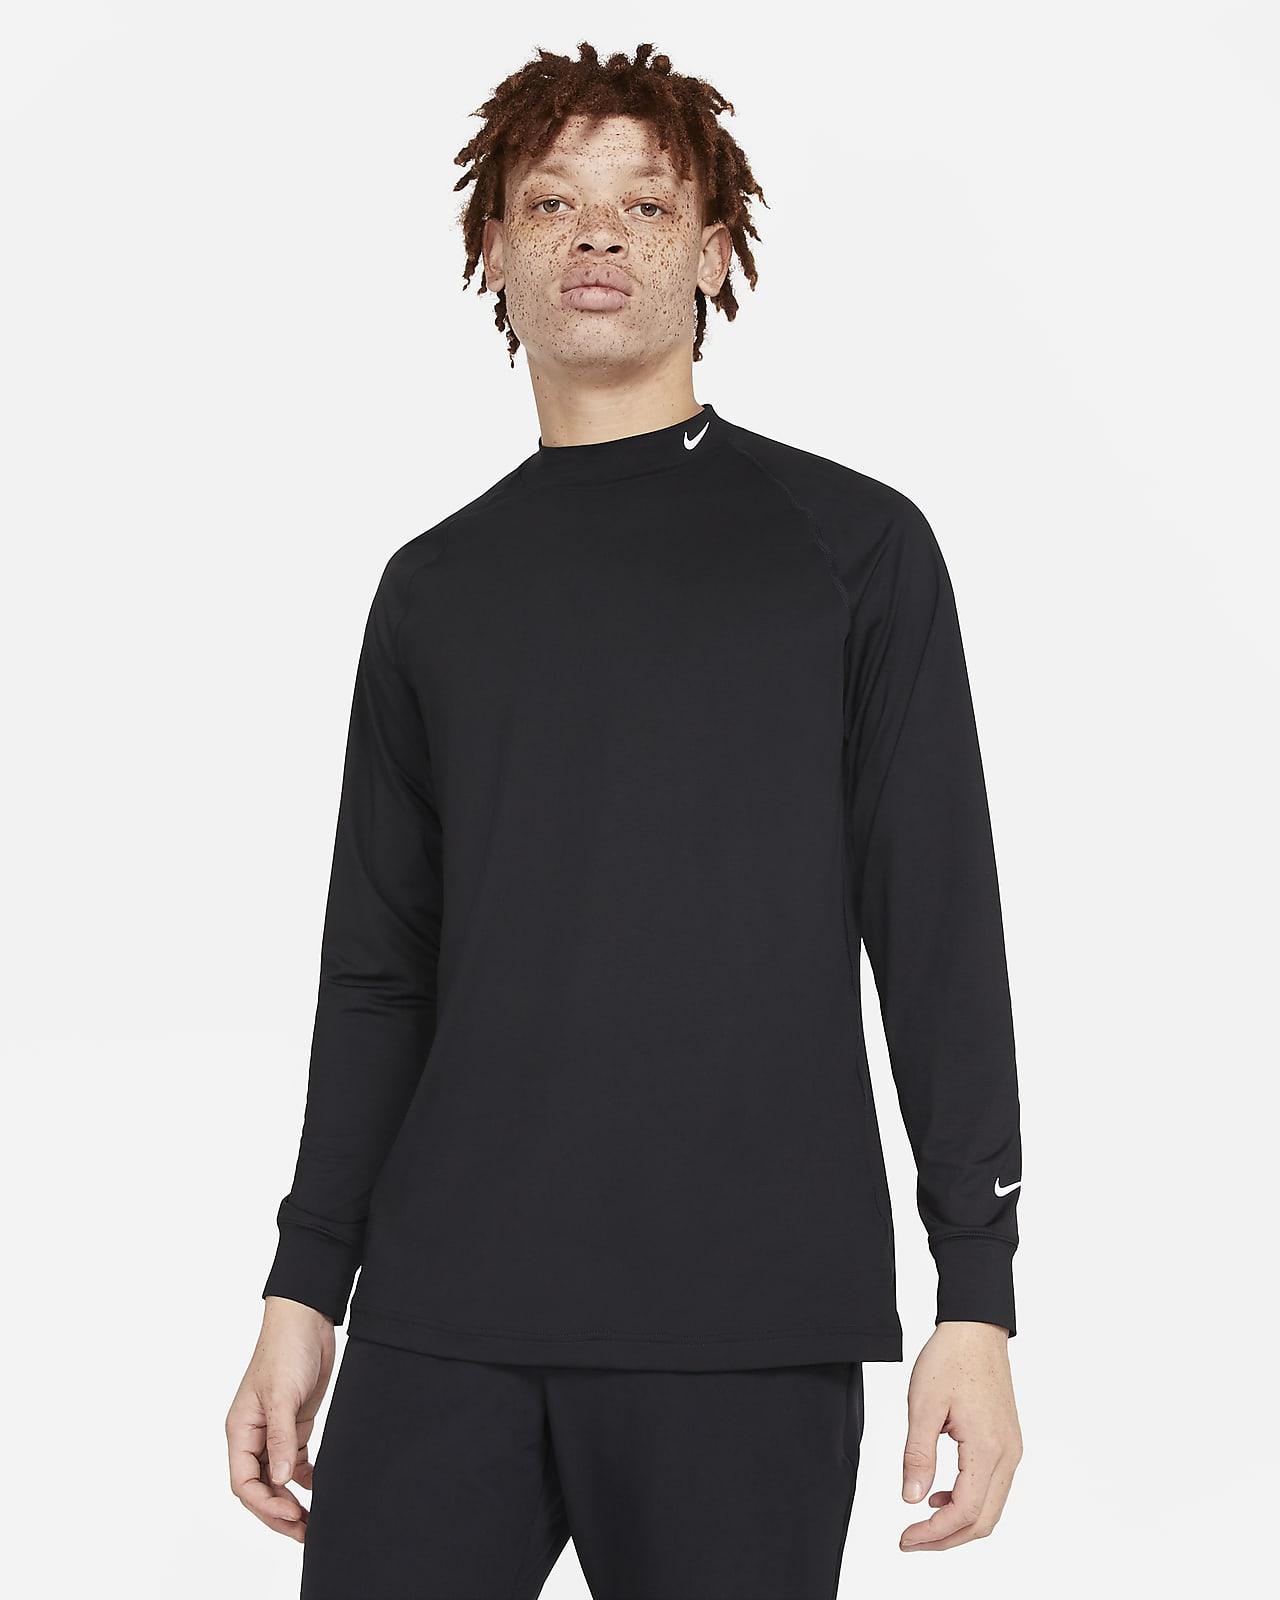 Nike Dri-FIT UV Vapor Men's Long-Sleeve Golf Top